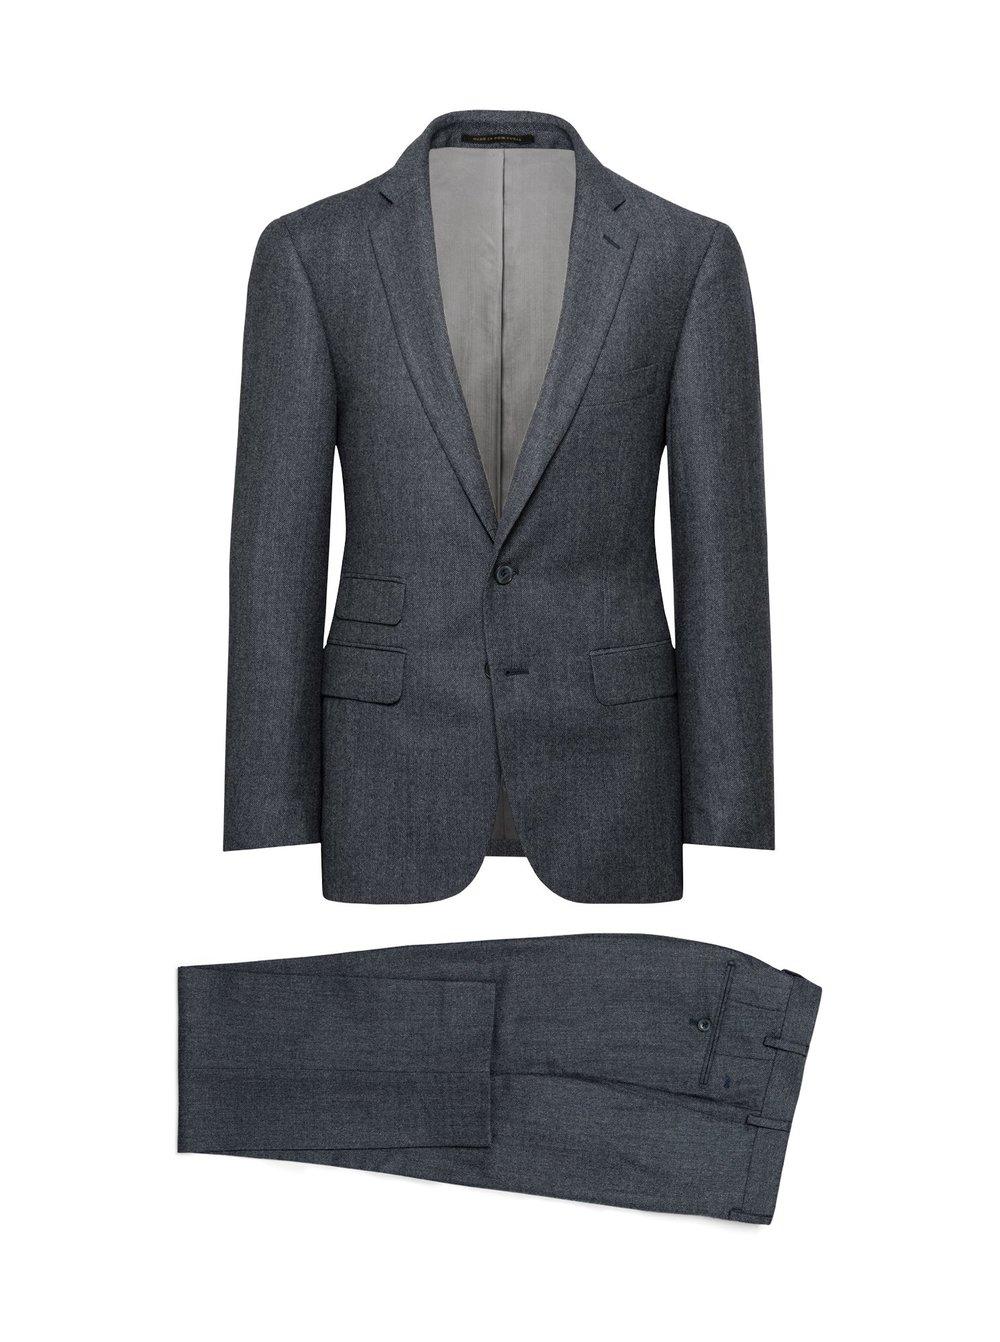 J. Hilburn Storm Blue Nailhead Suit